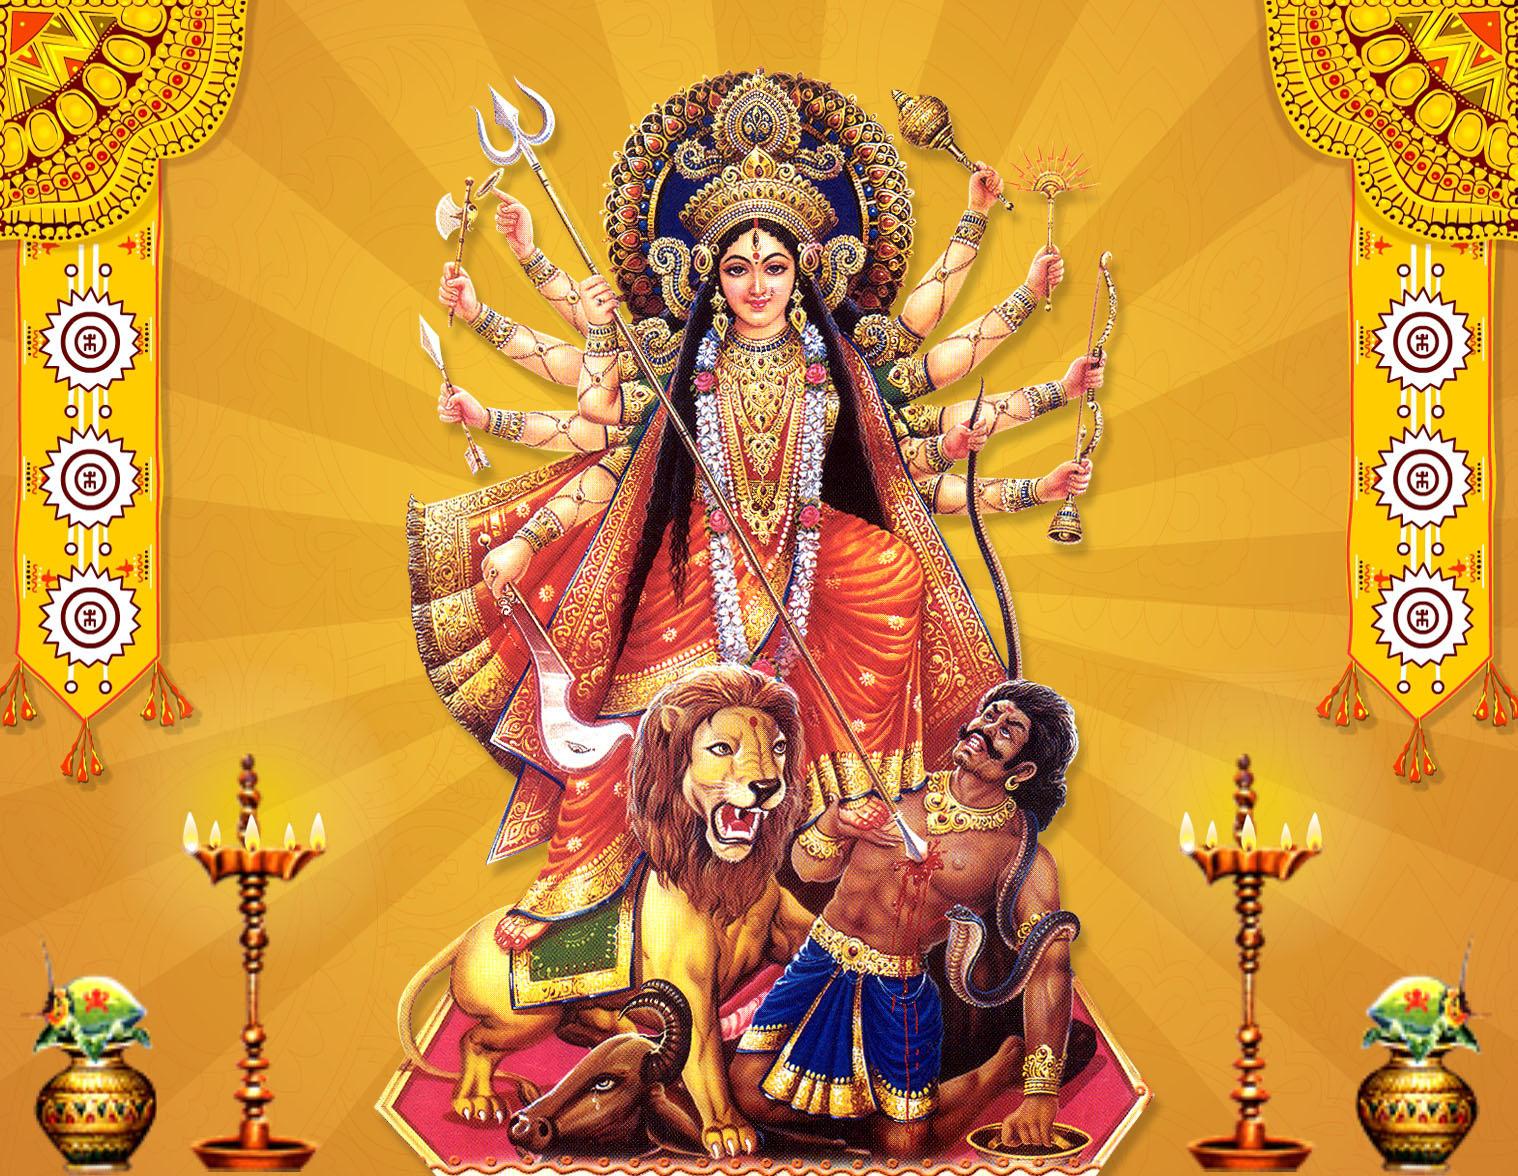 Durga Puja Hd Wallpaper